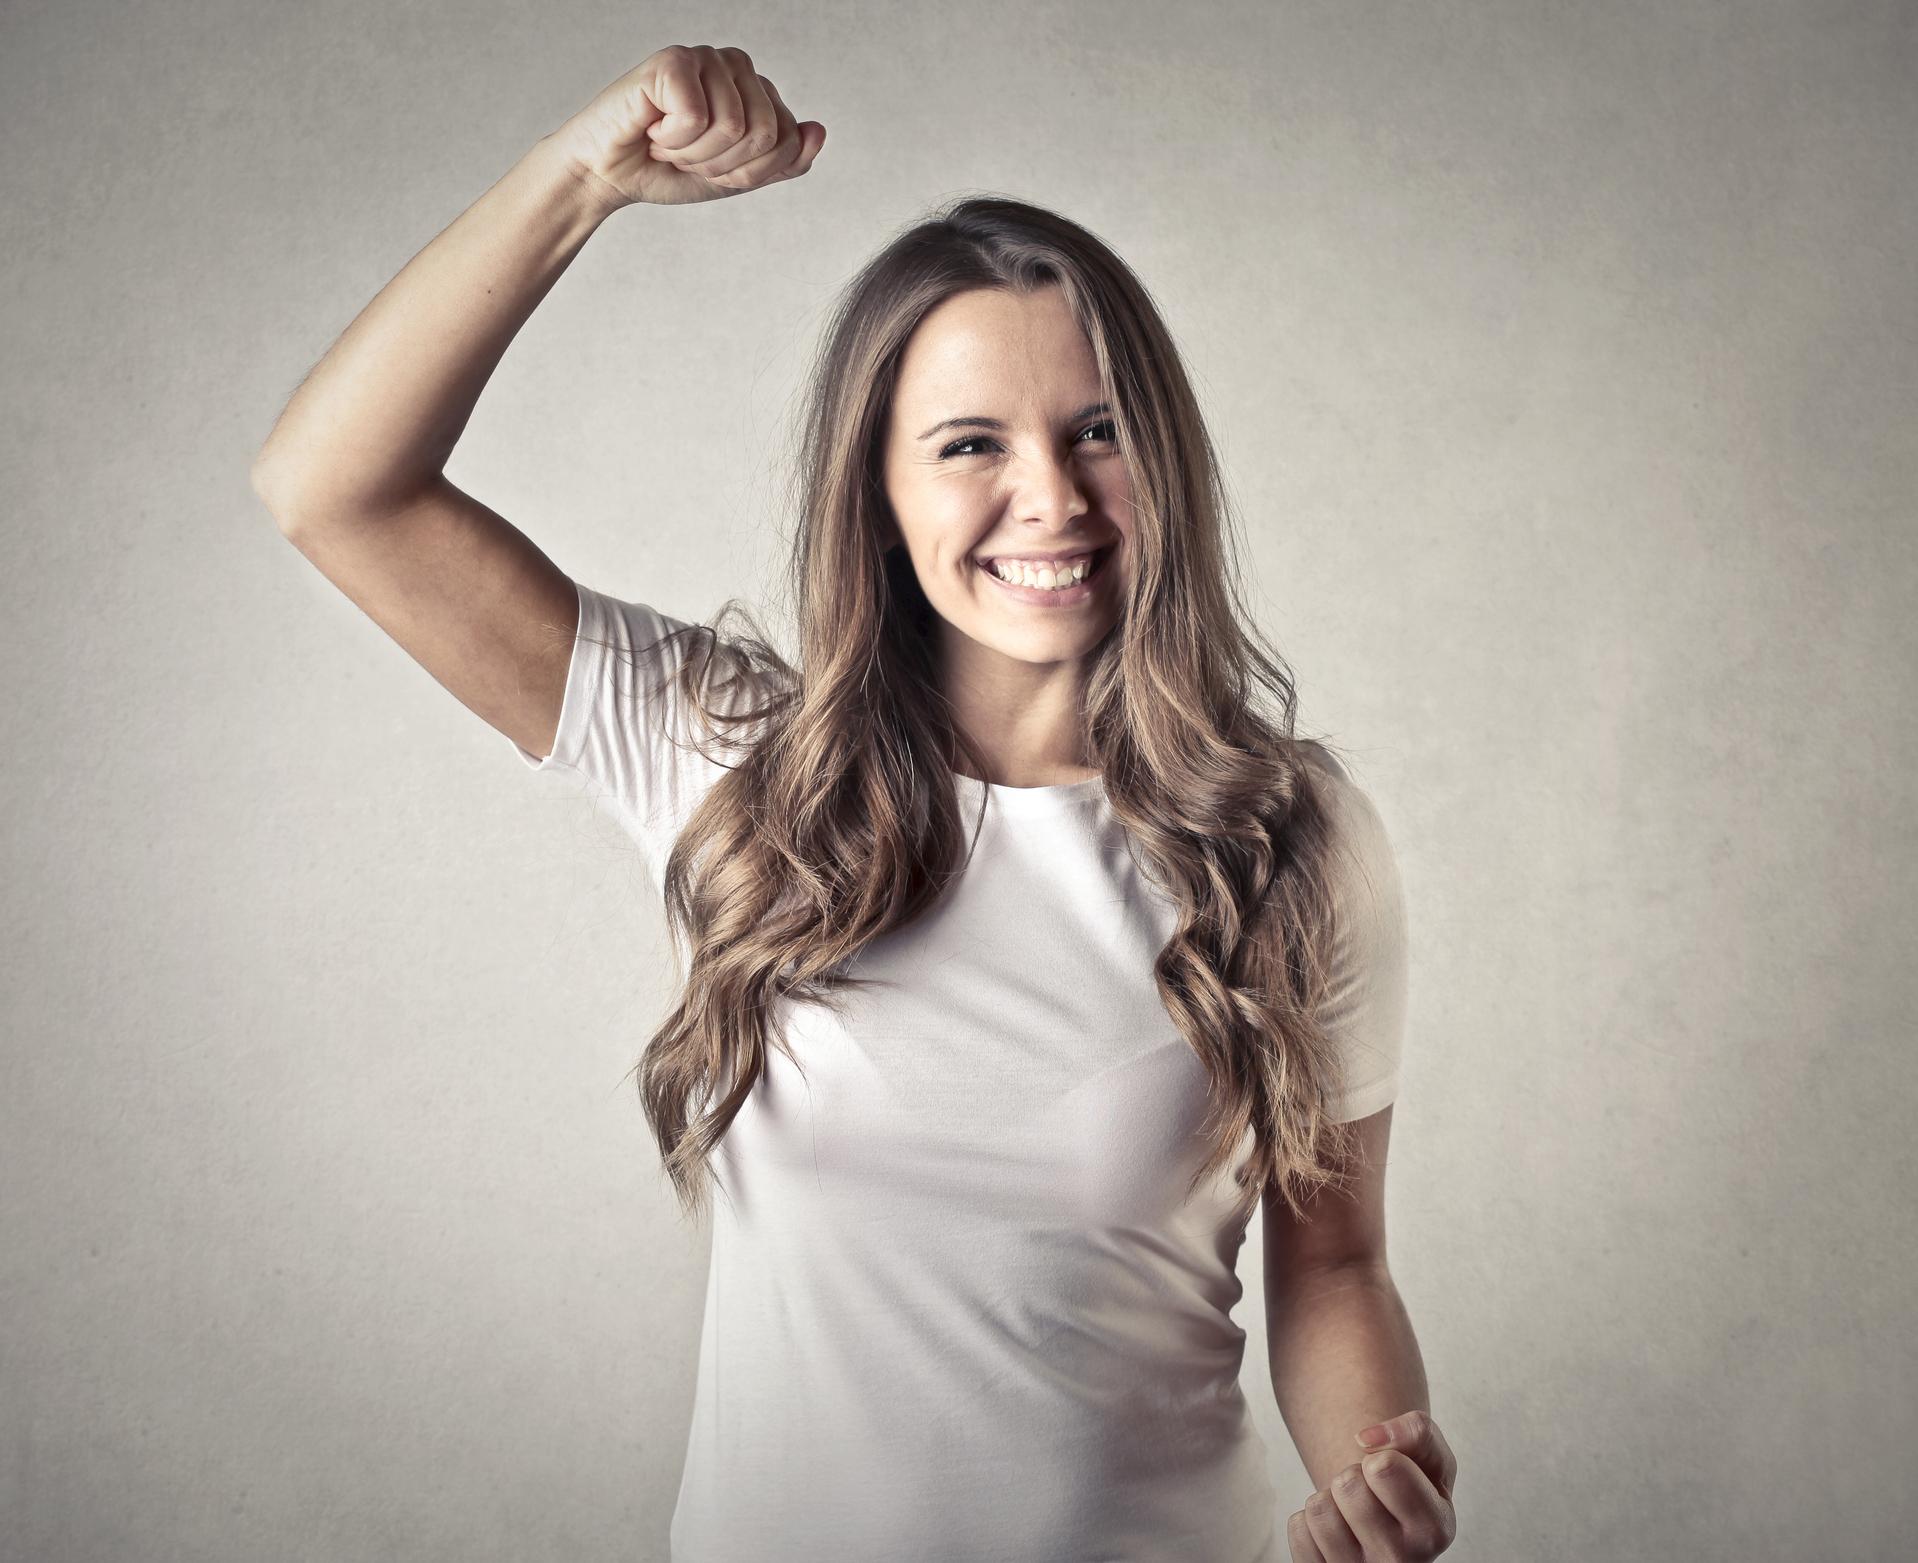 Strength, positivity, fiercely positive, girl power, girl boss, women entrepreneurs, The Buzz Maker, the TBM Advantage, Public Relations, PR.